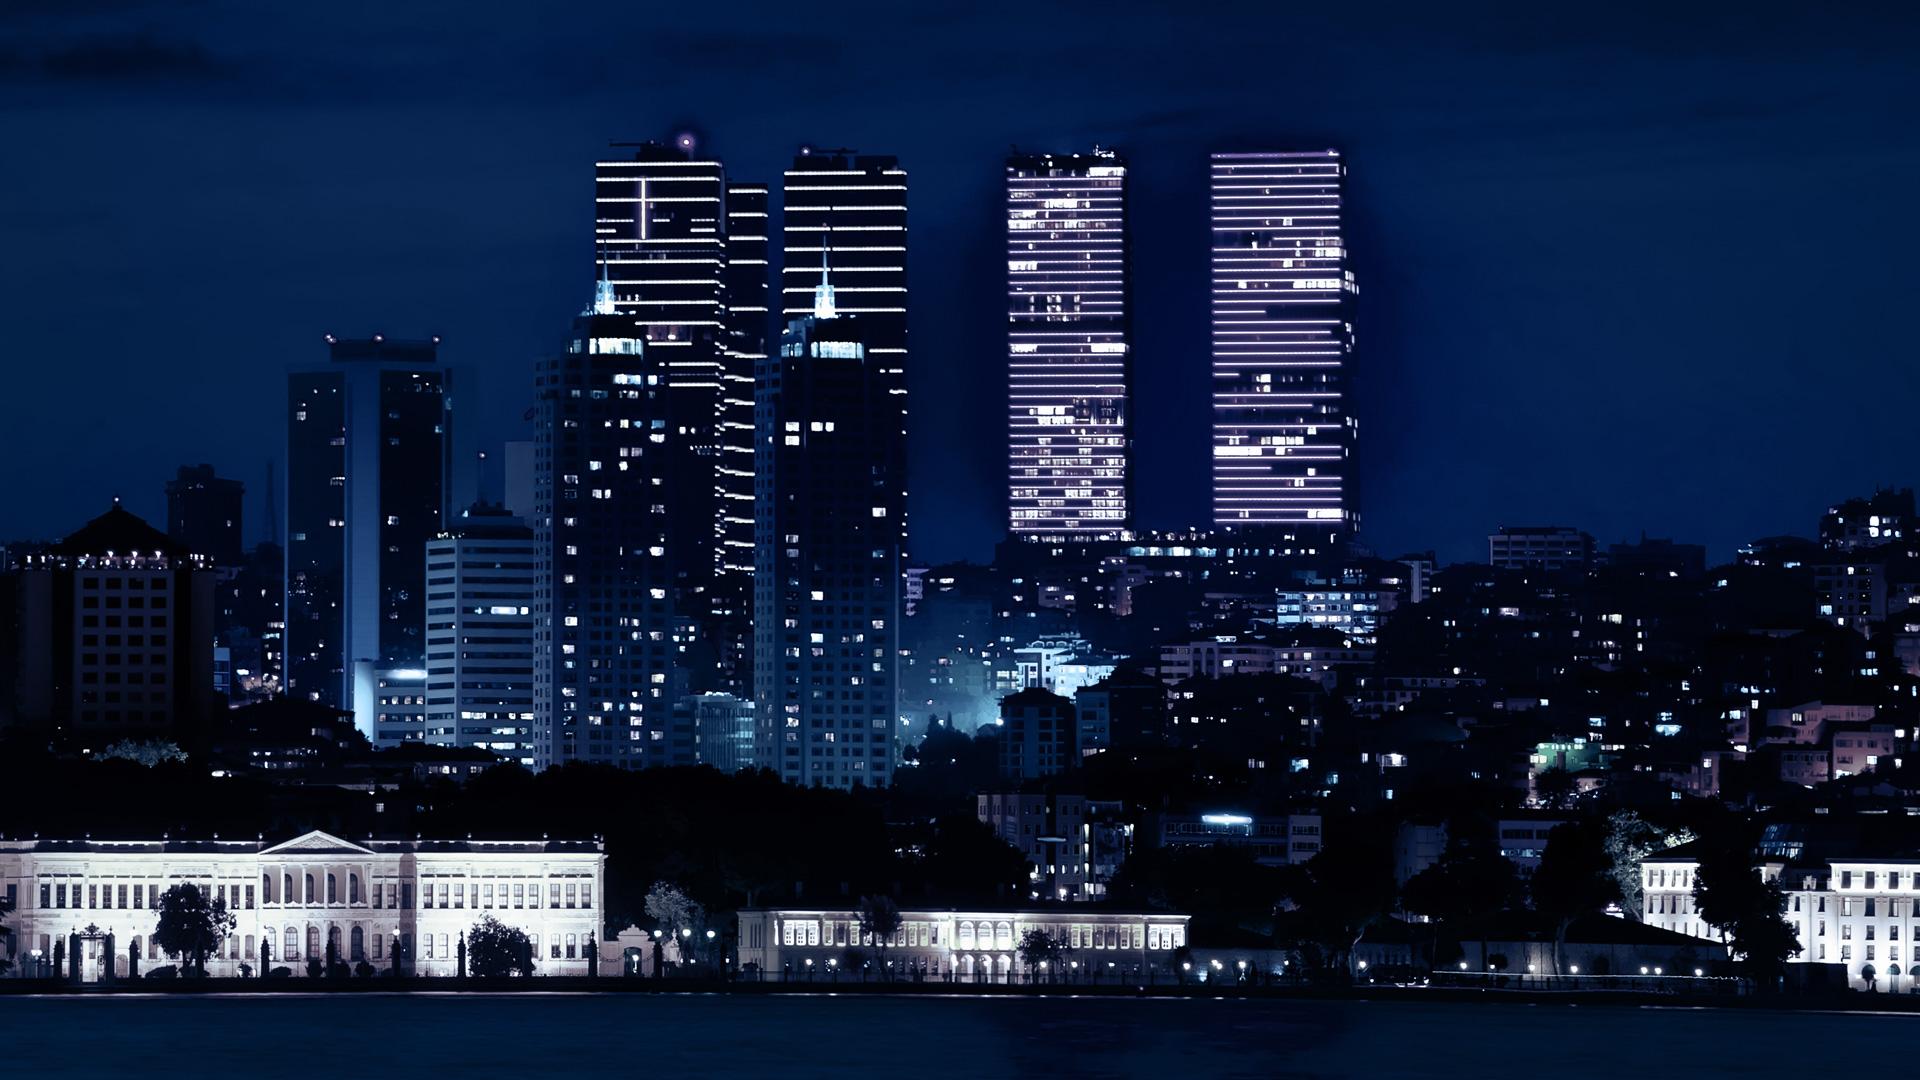 إيلاف إسطنبول - اتصل بنا